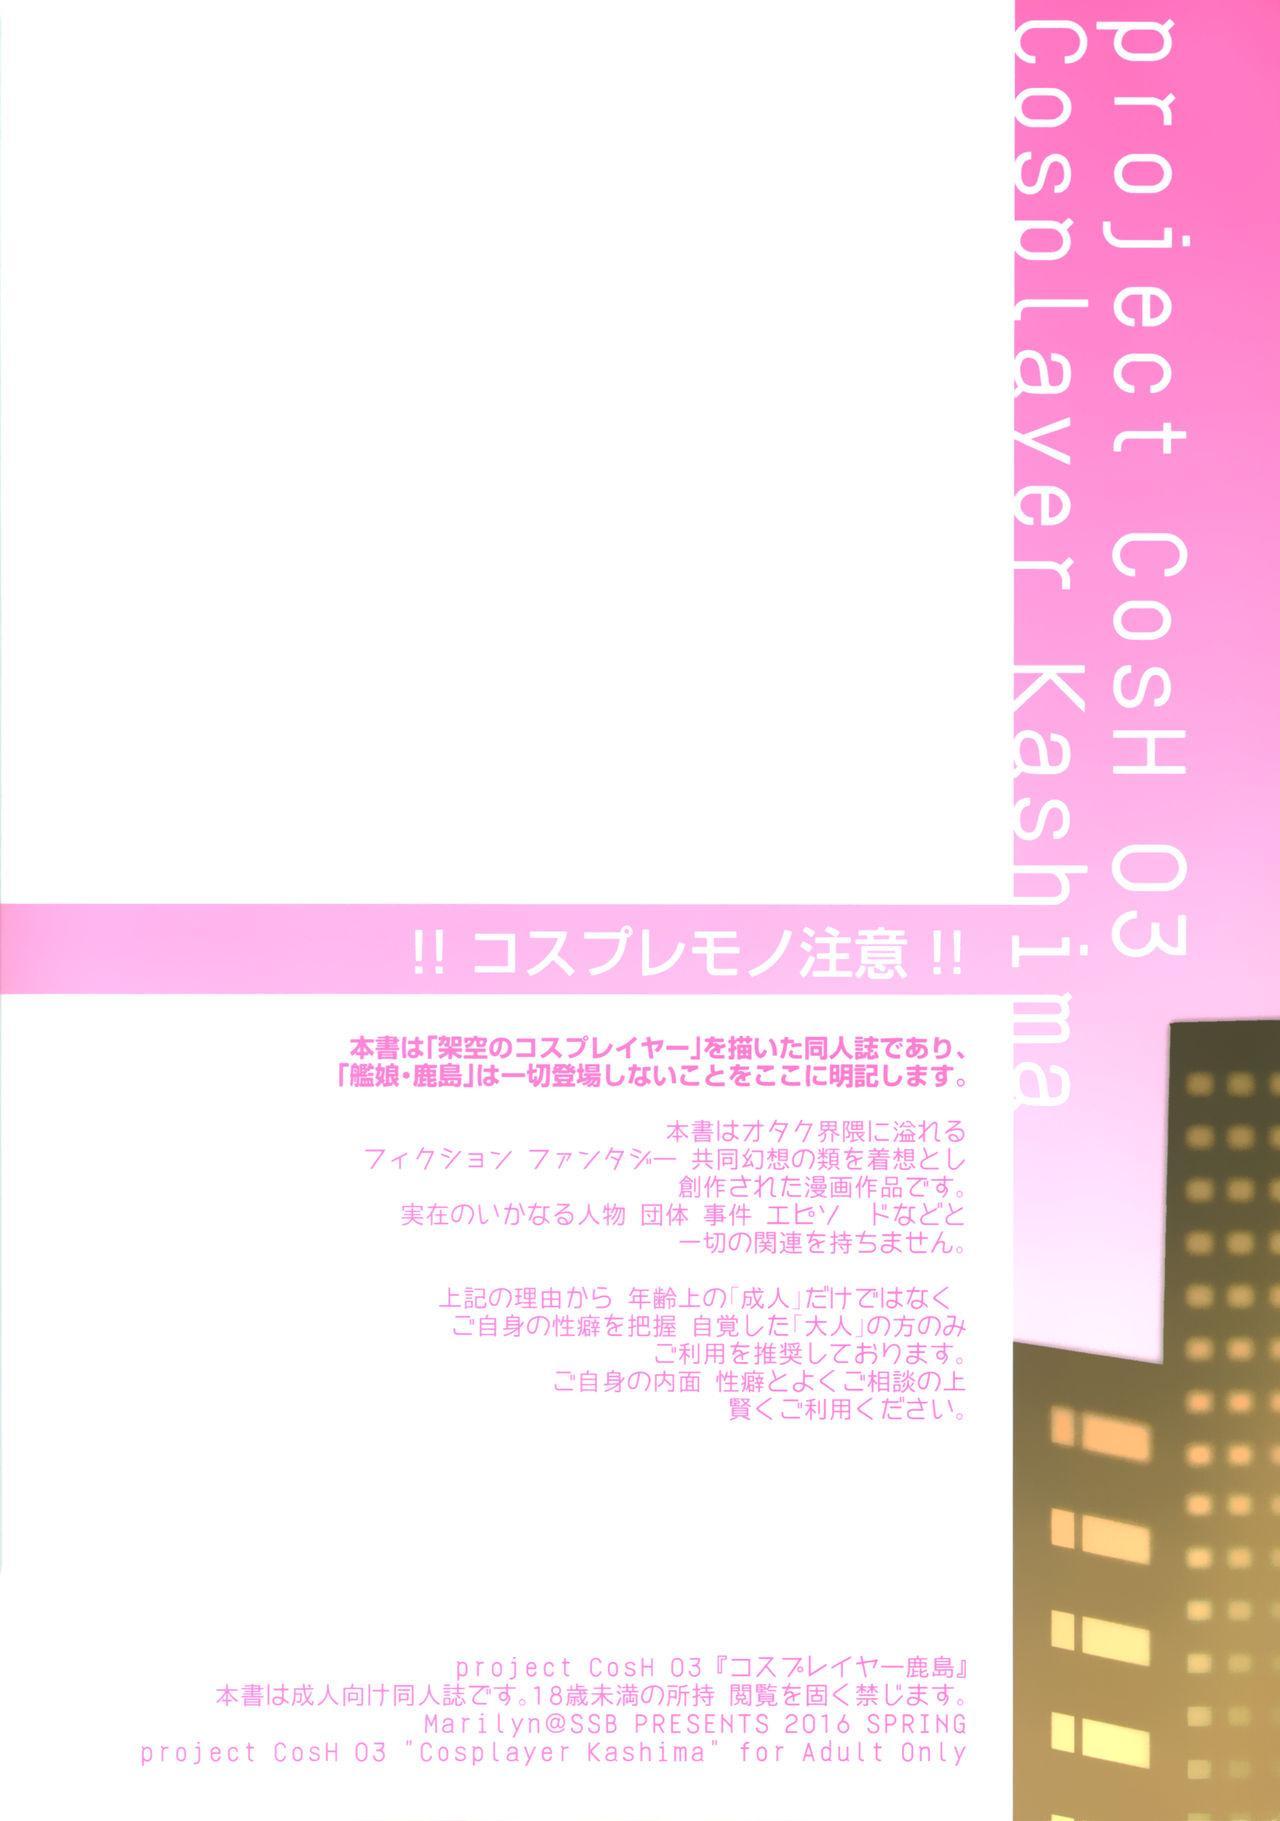 Cosplayer Kashima 22